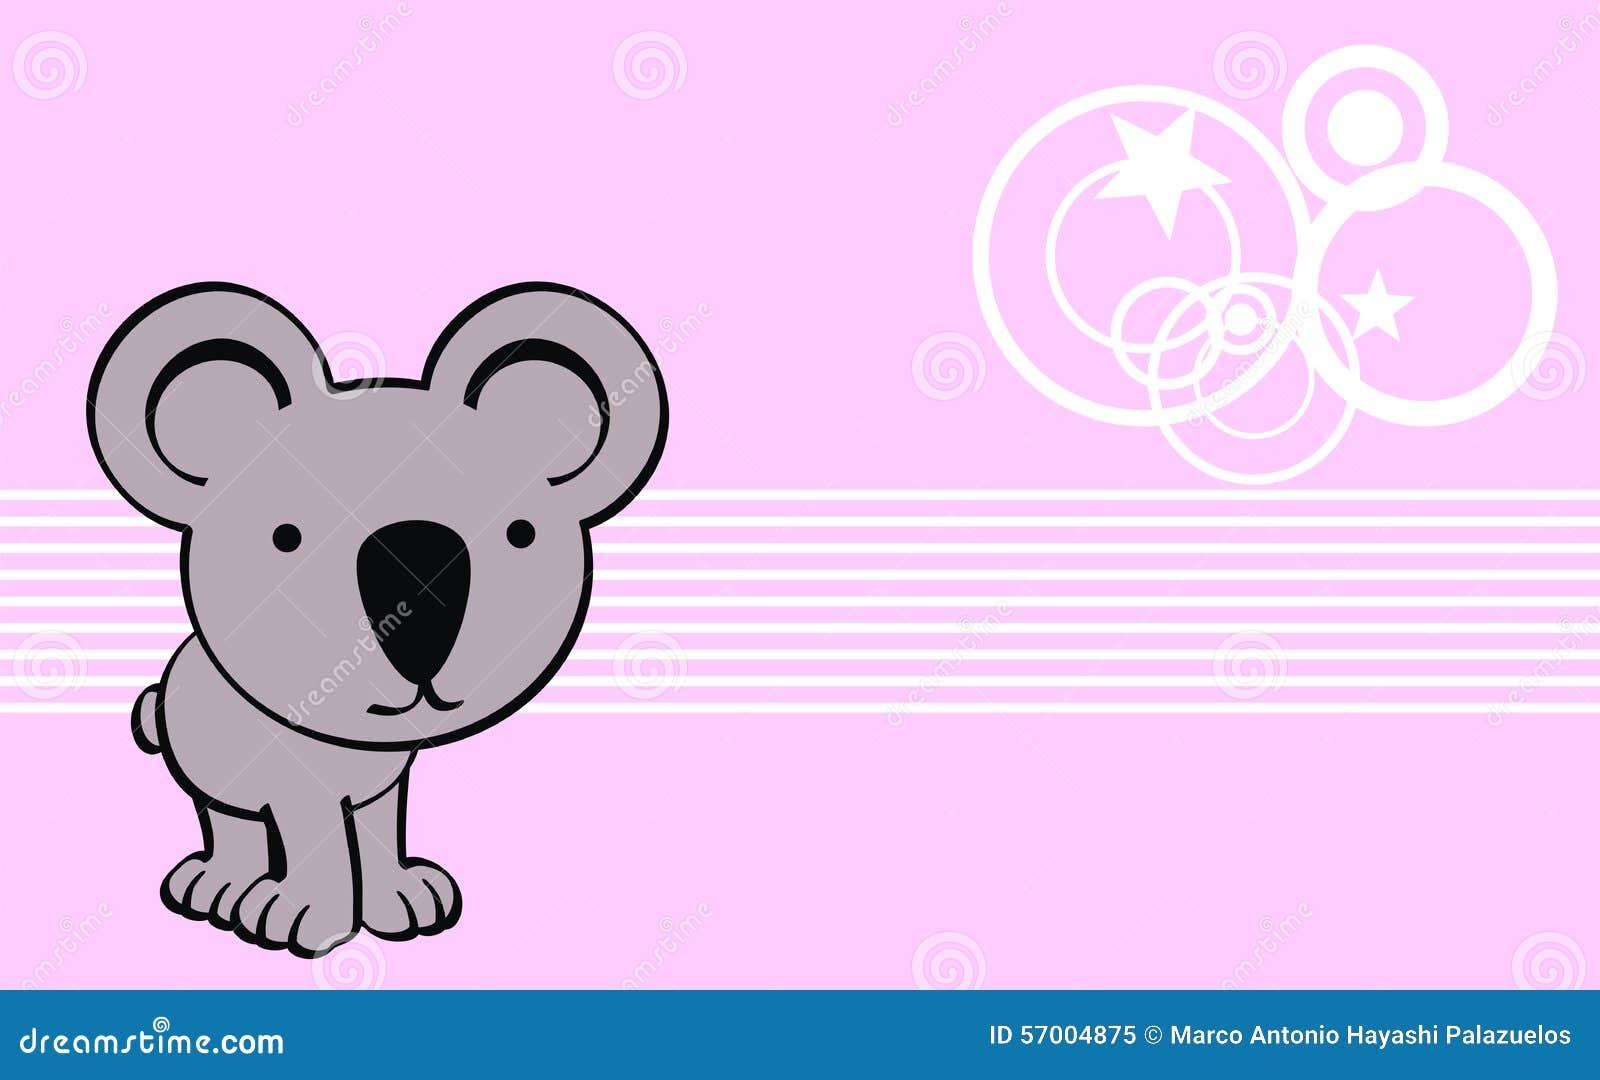 Most Inspiring Wallpaper Koala Cartoon - sweet-baby-koala-cartoon-cute-background-animals-vector-57004875  Pic_94322   .jpg